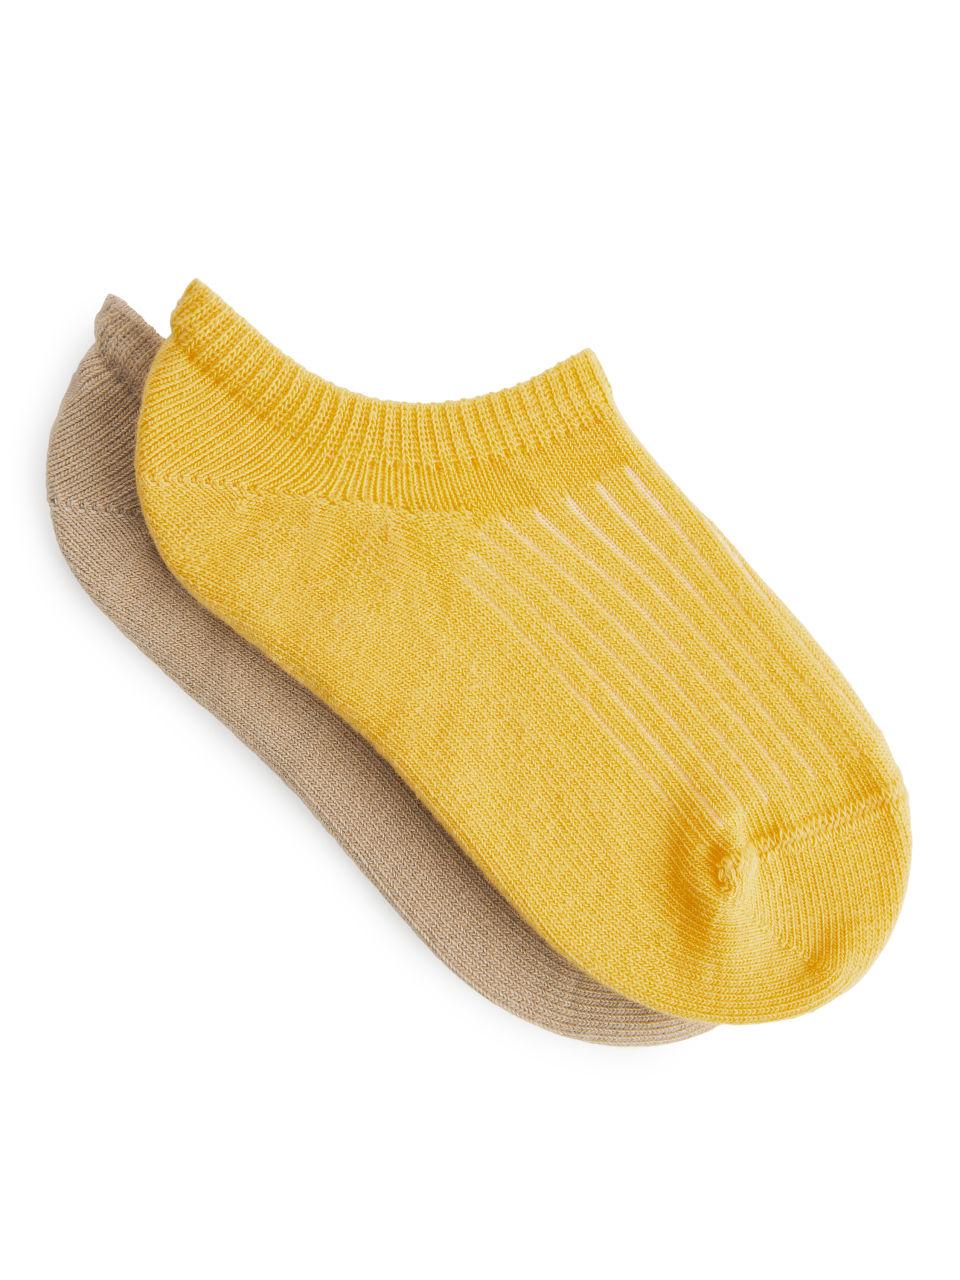 Sneaker Socks - Yellow